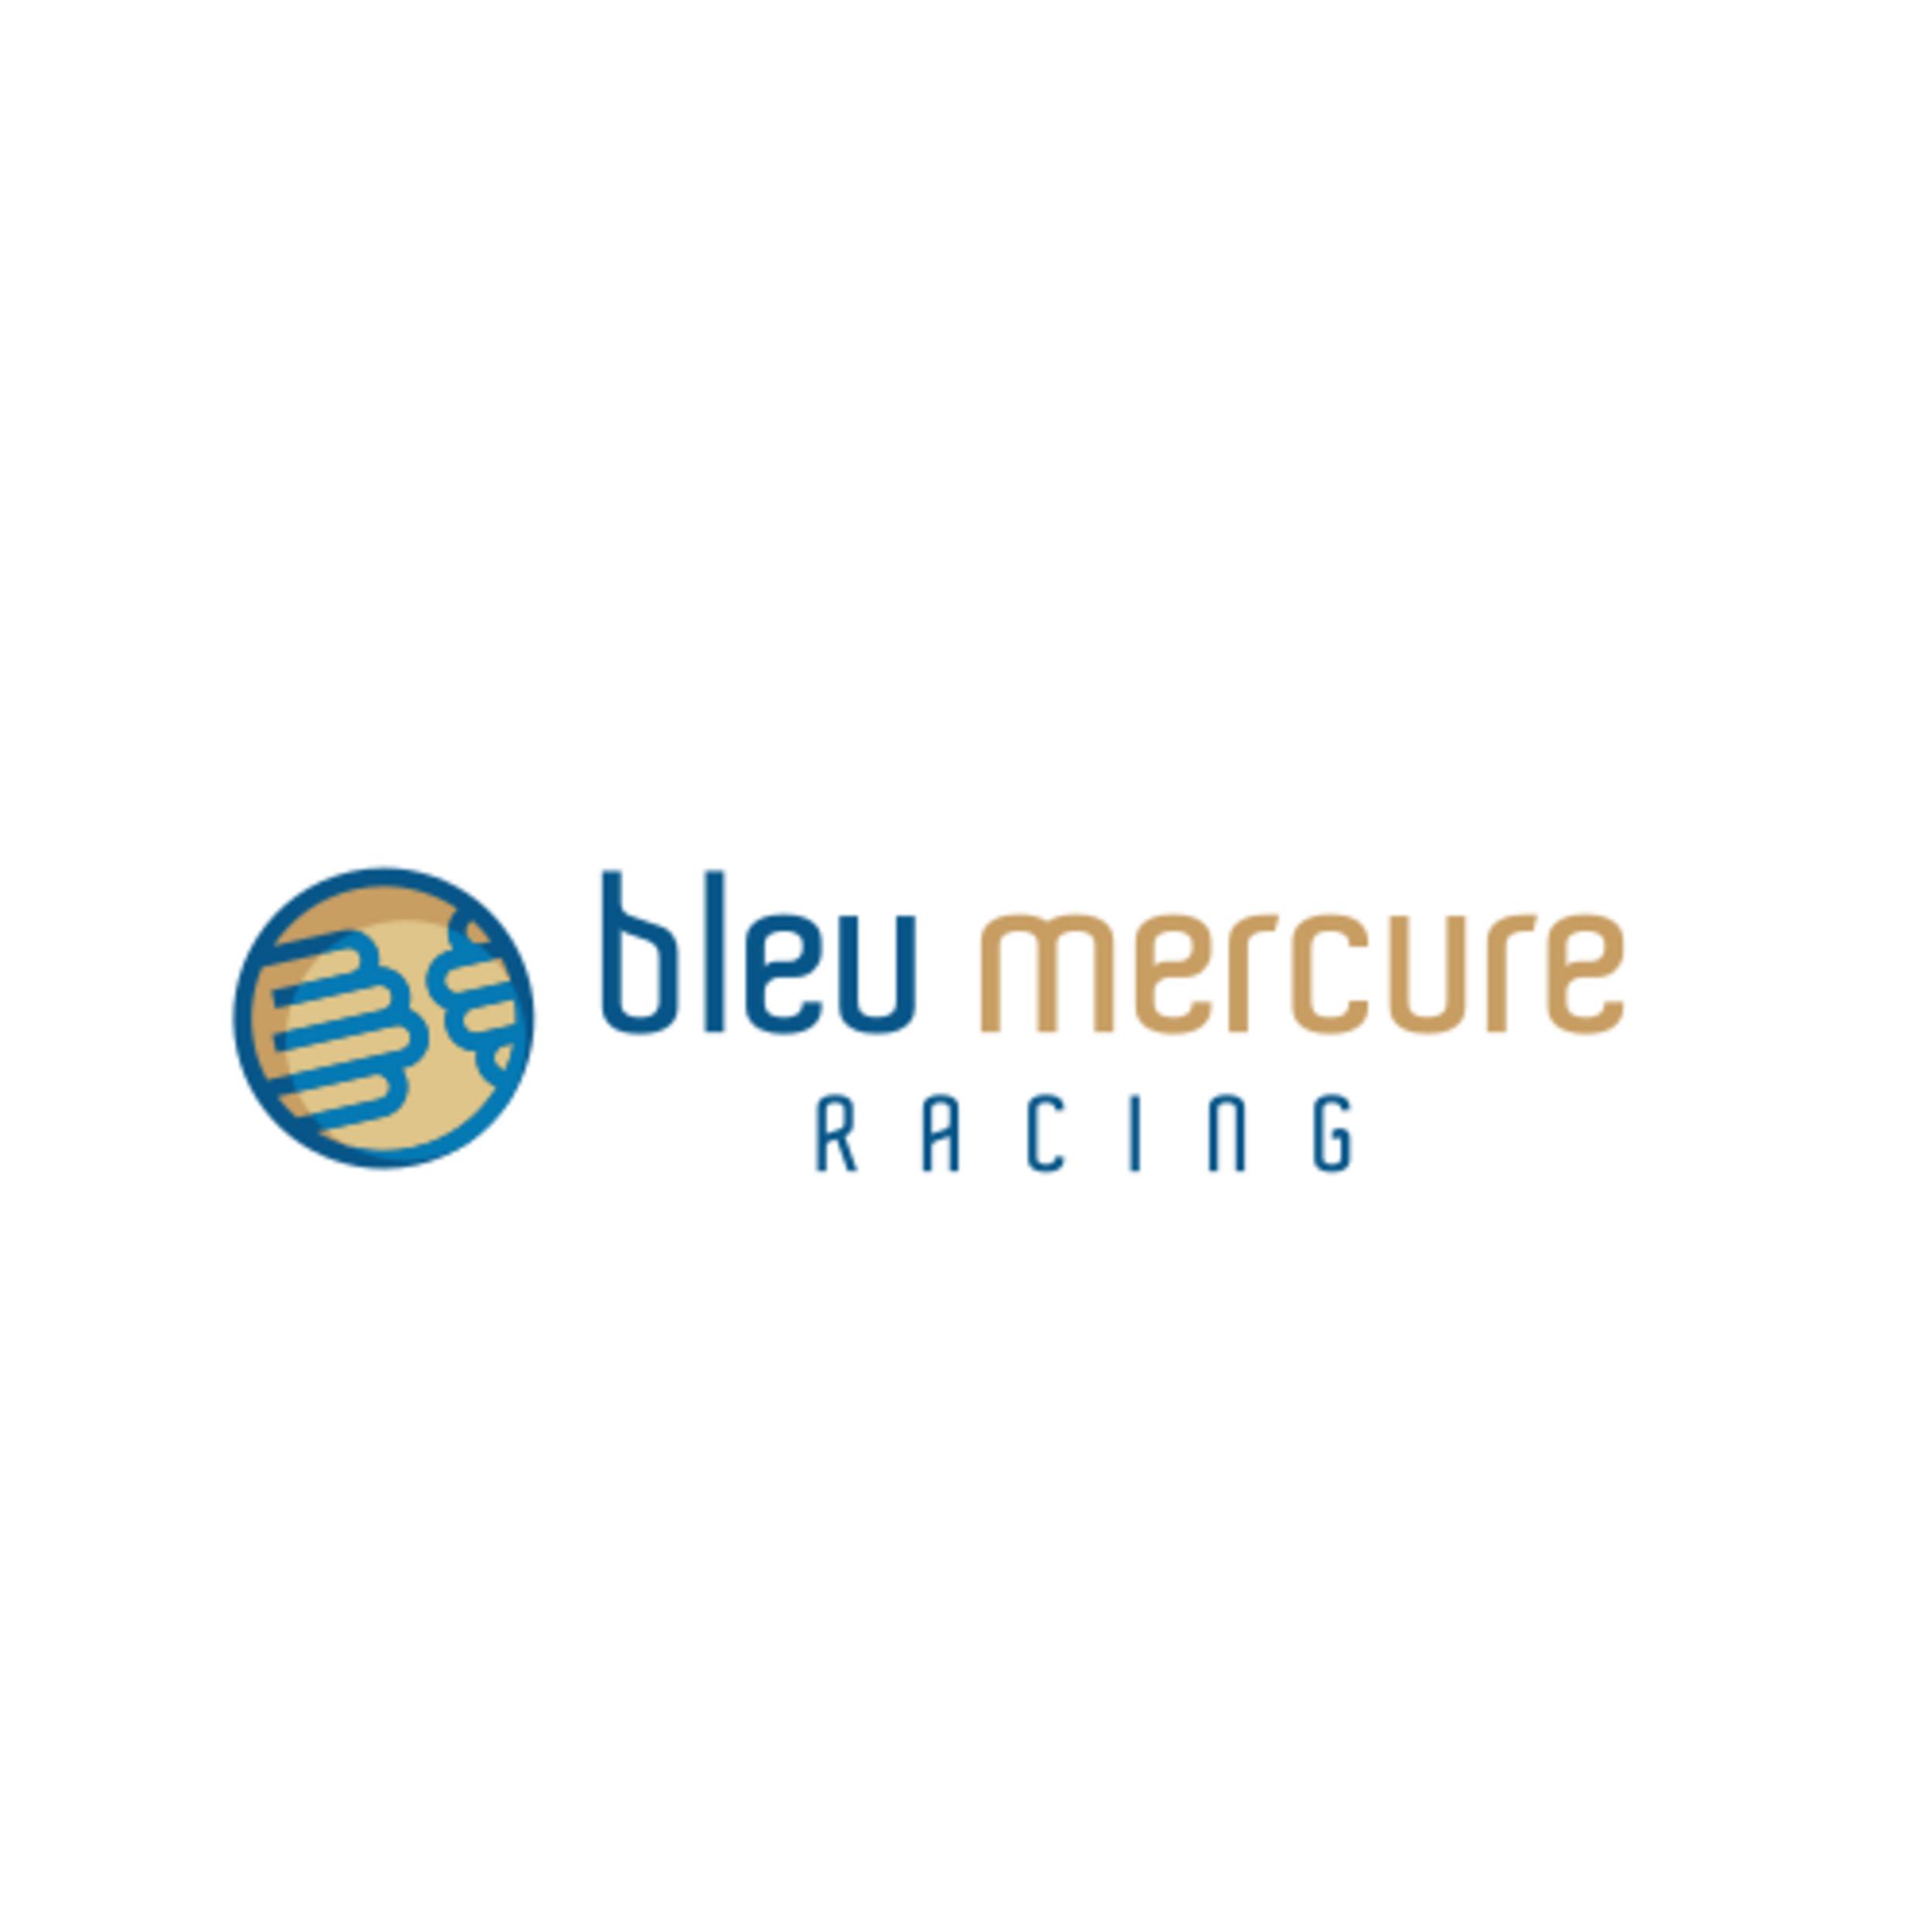 Bleu Mercure